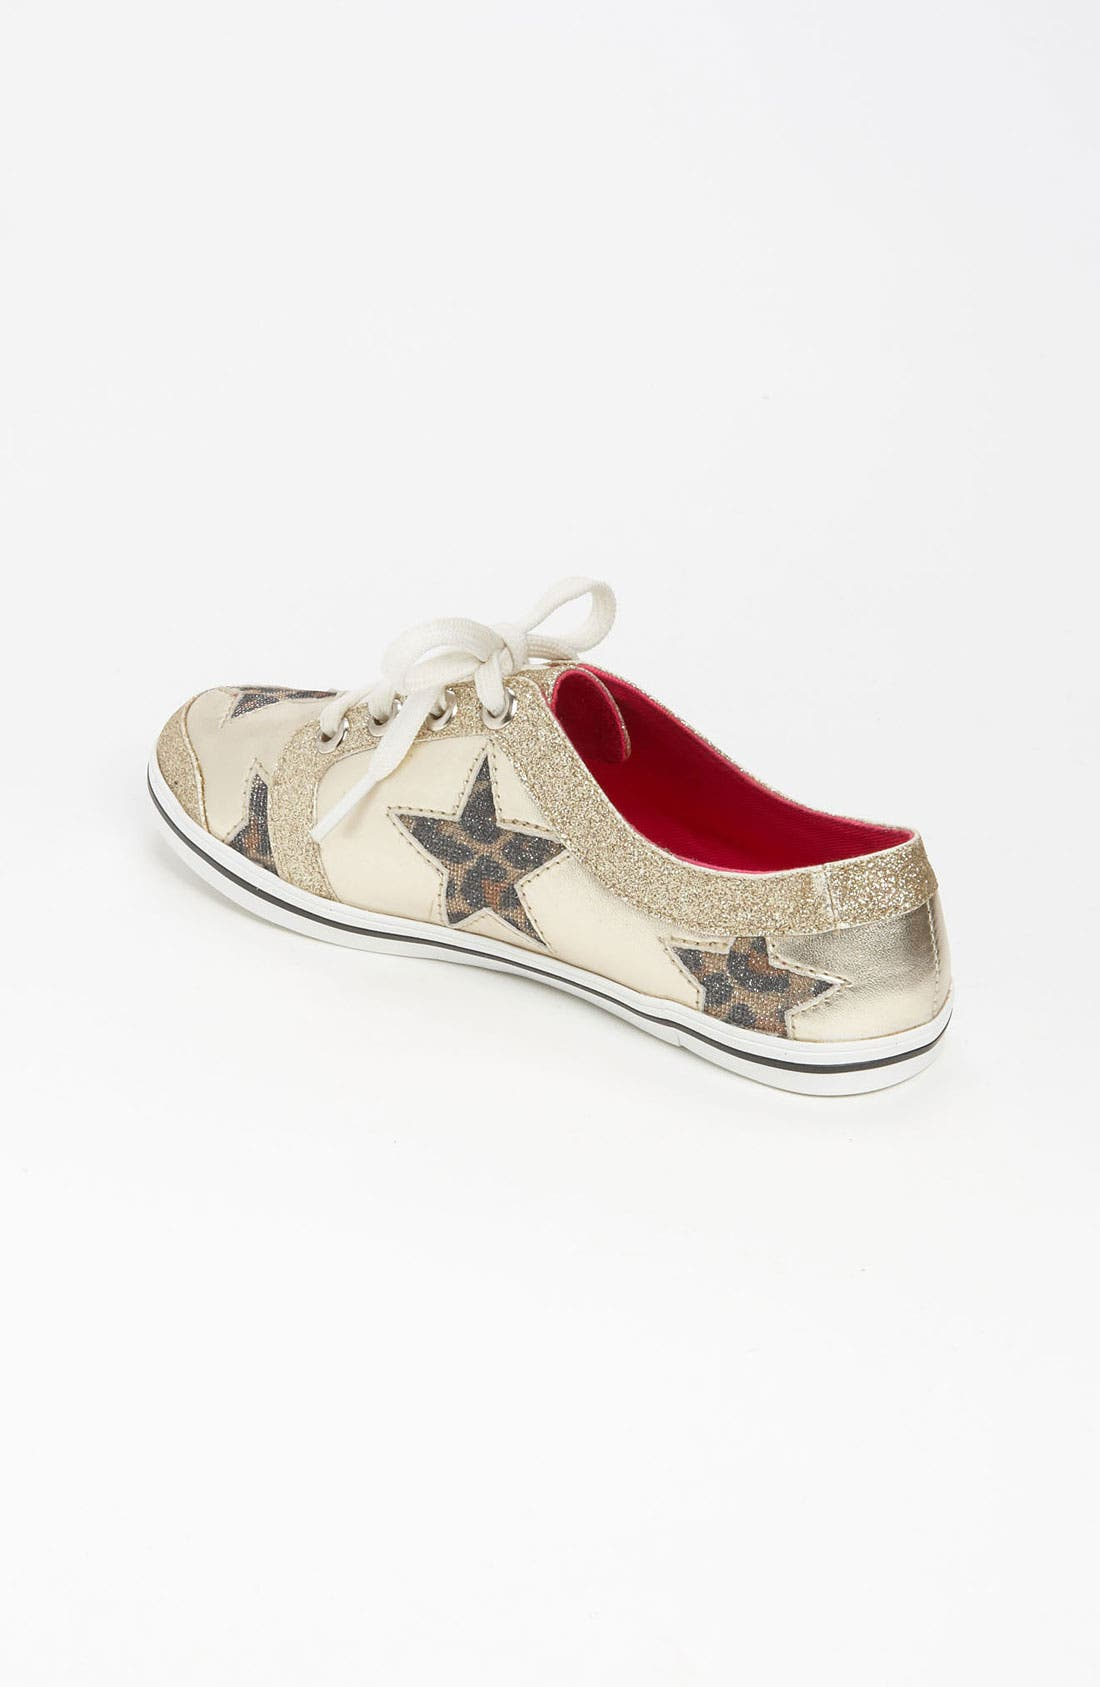 Alternate Image 2  - Juicy Couture 'Star' Sneaker (Toddler, Little Kid & Big Kid)